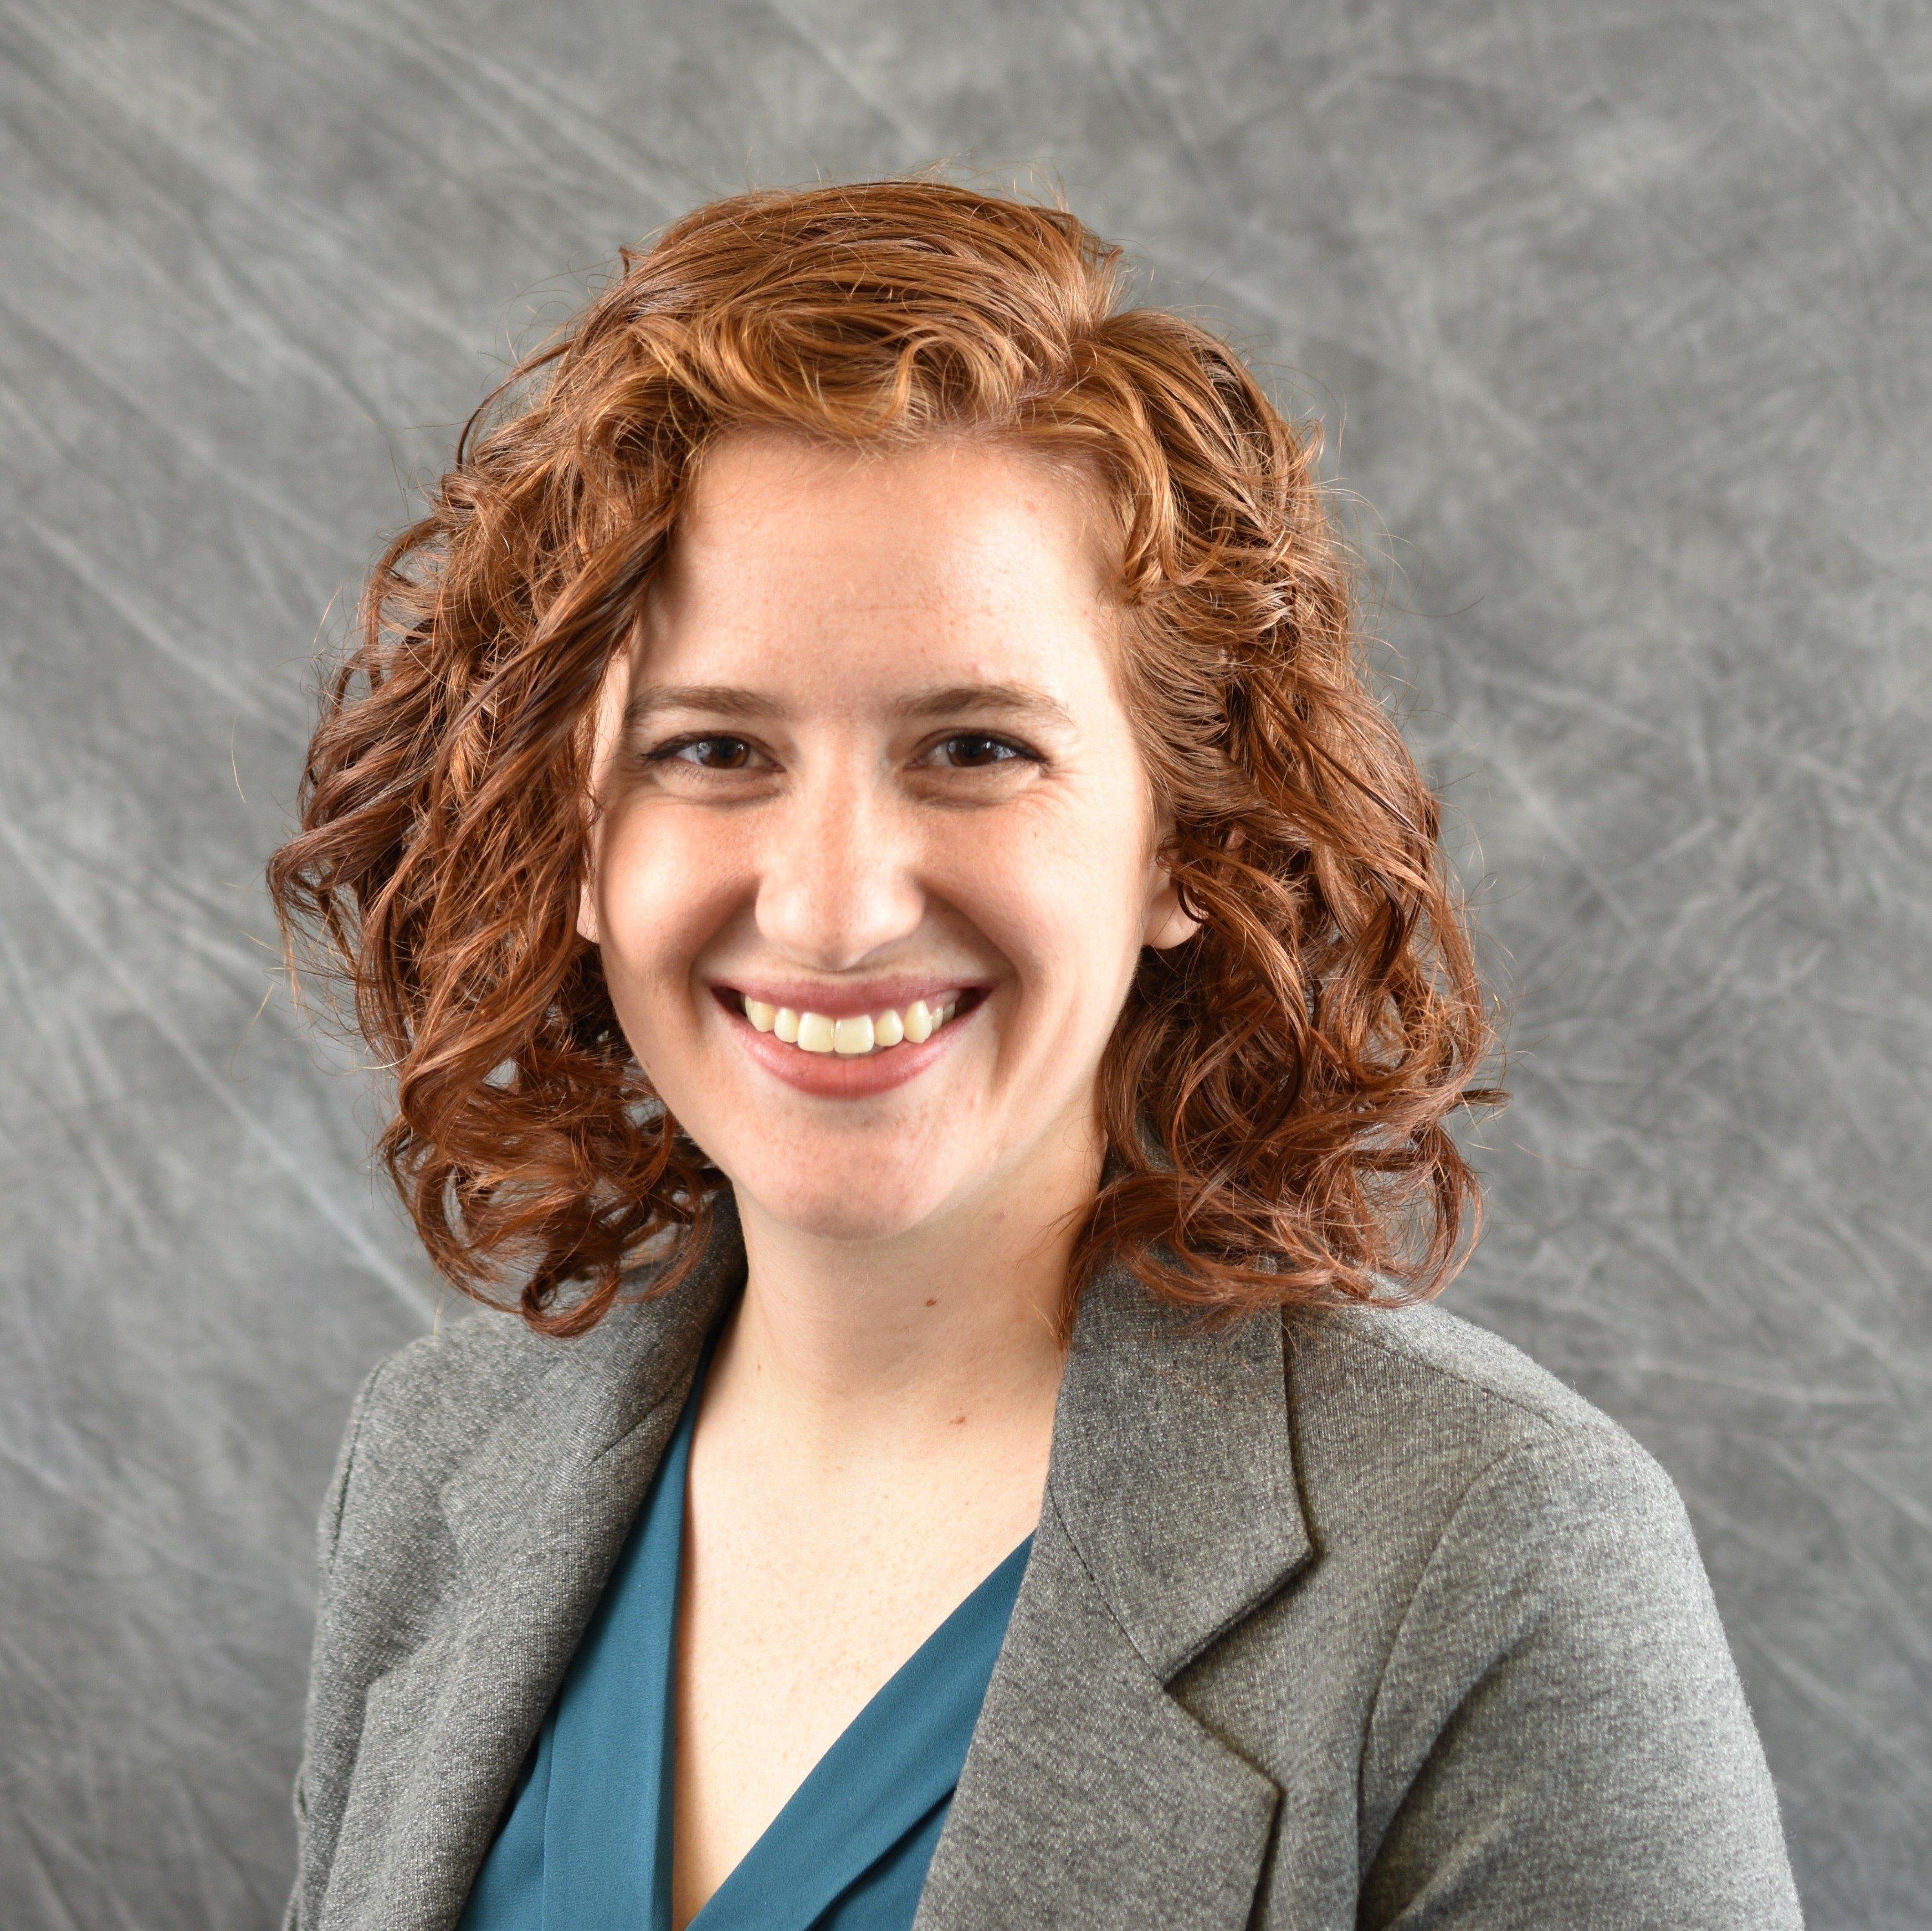 Nicole Clements, MS, LAT, ATC